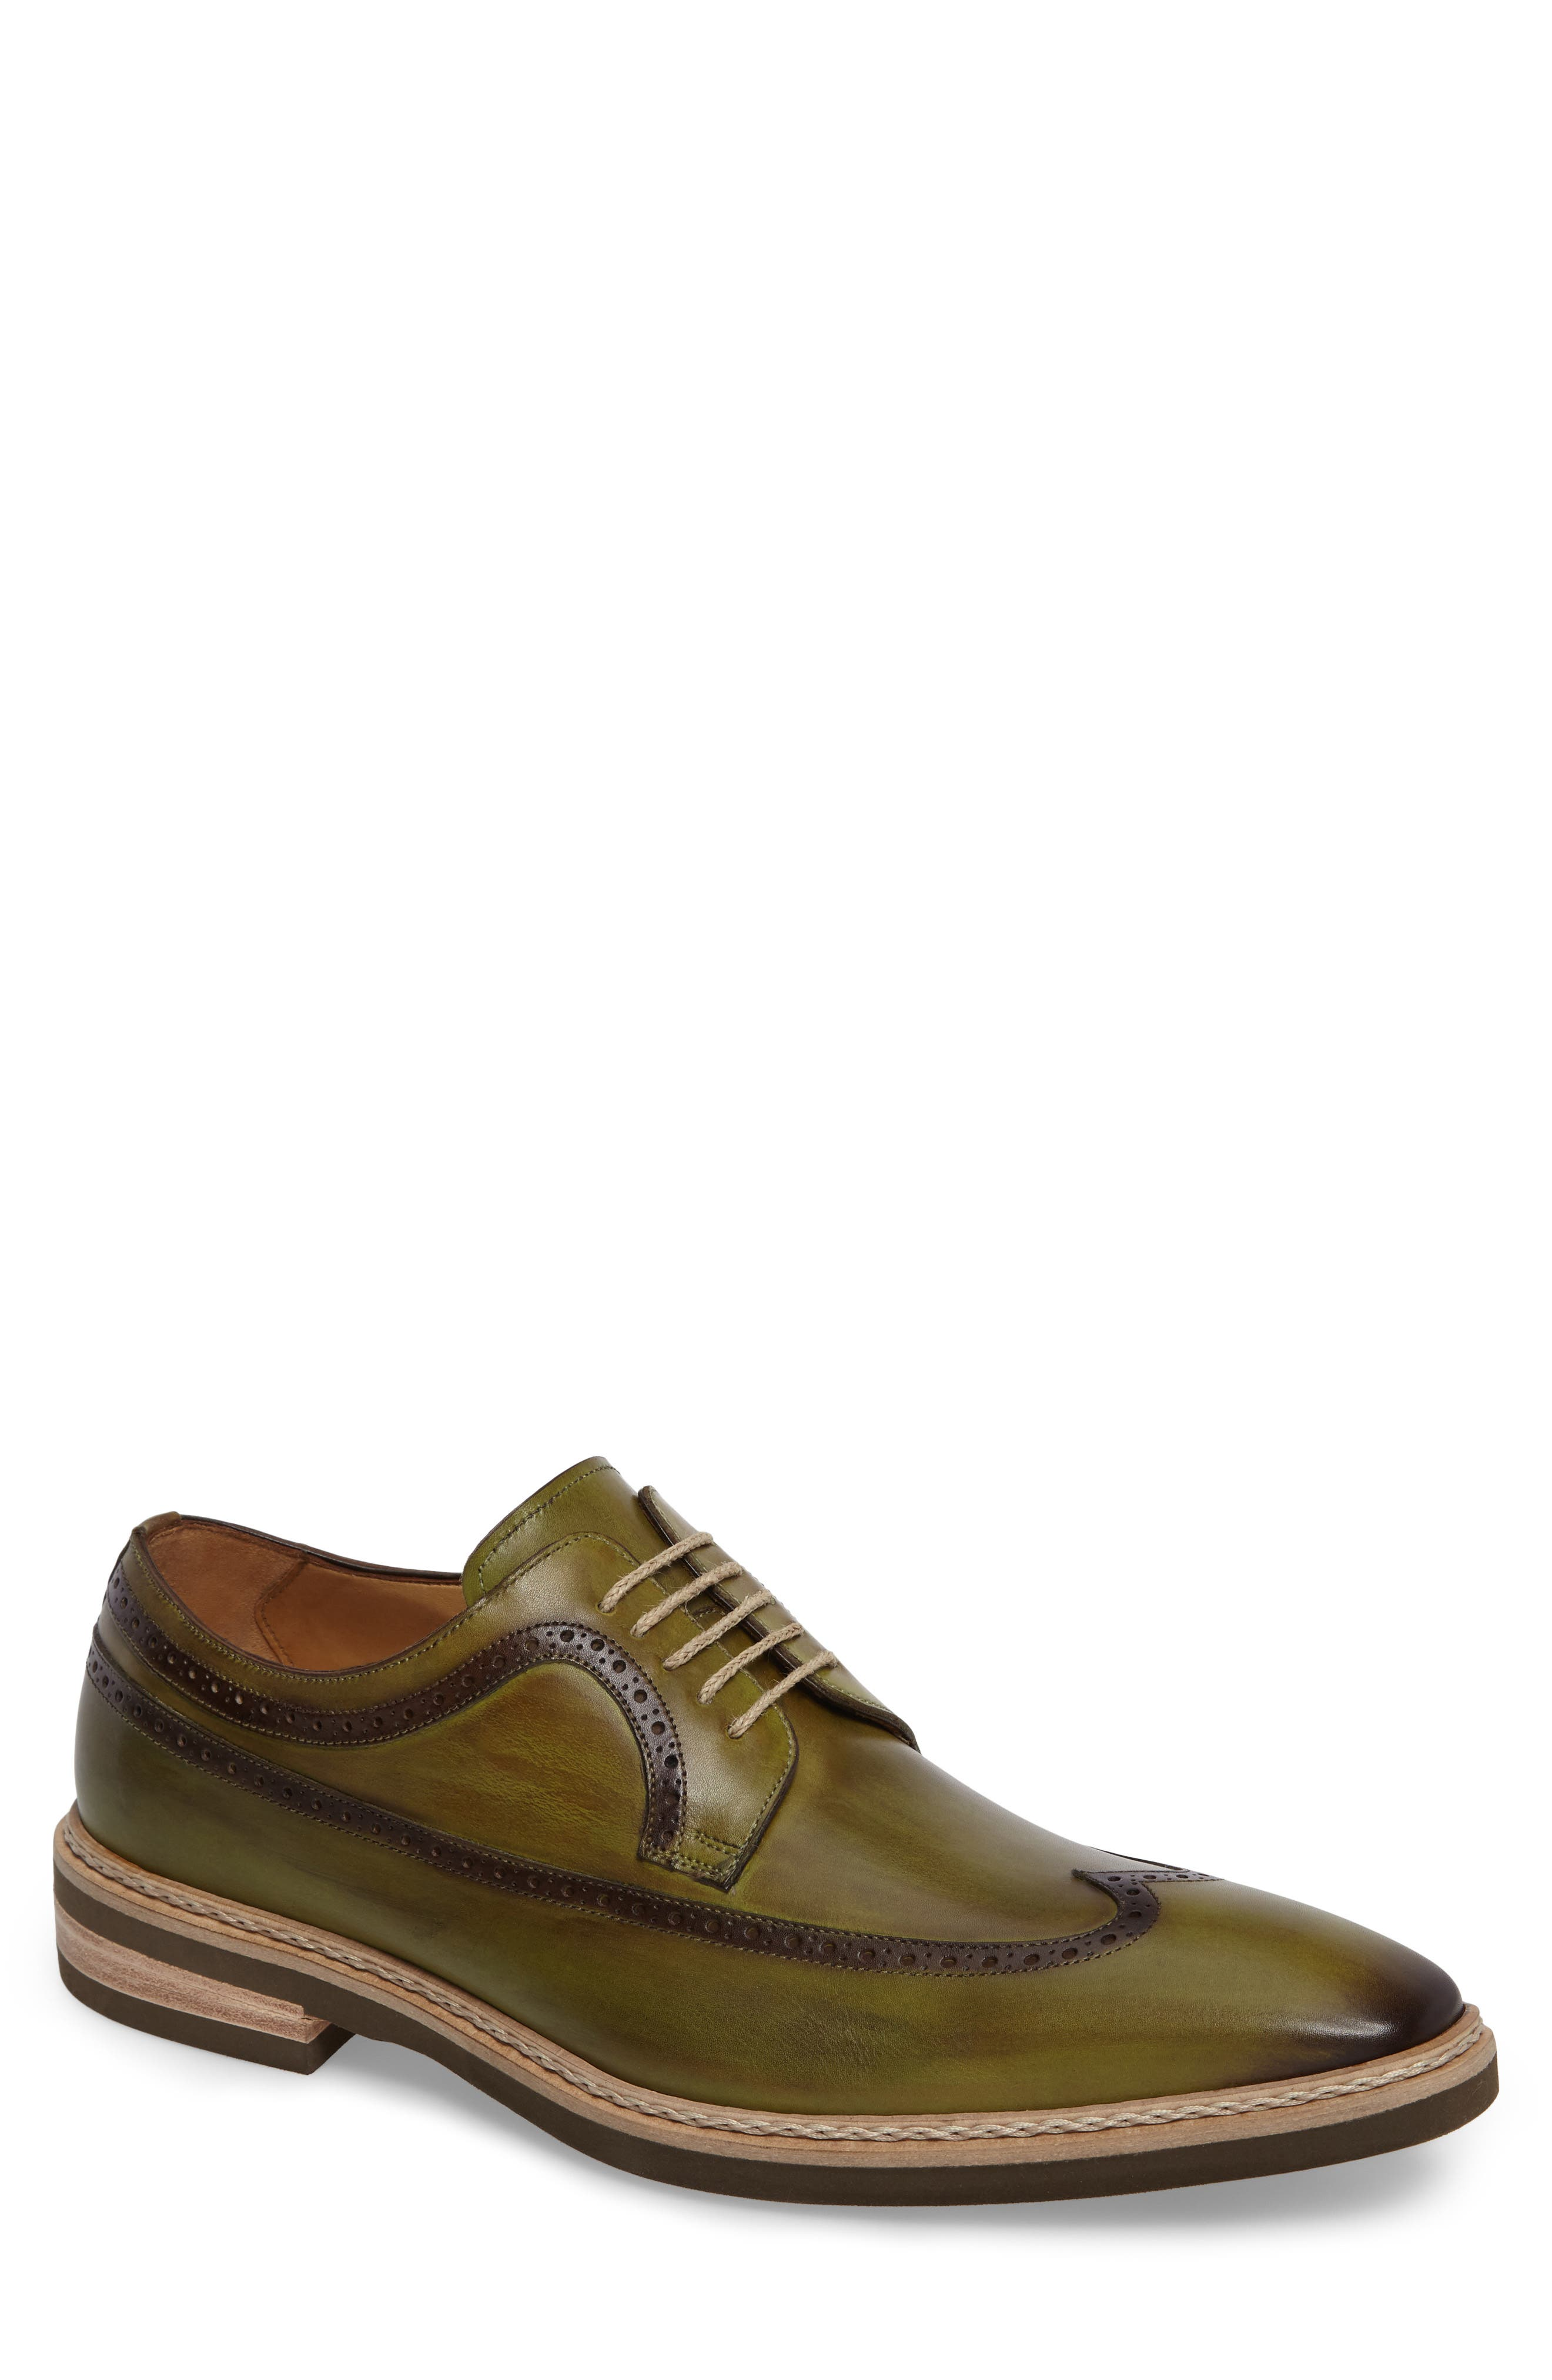 Maraval Wingtip,                         Main,                         color, Olive Leather